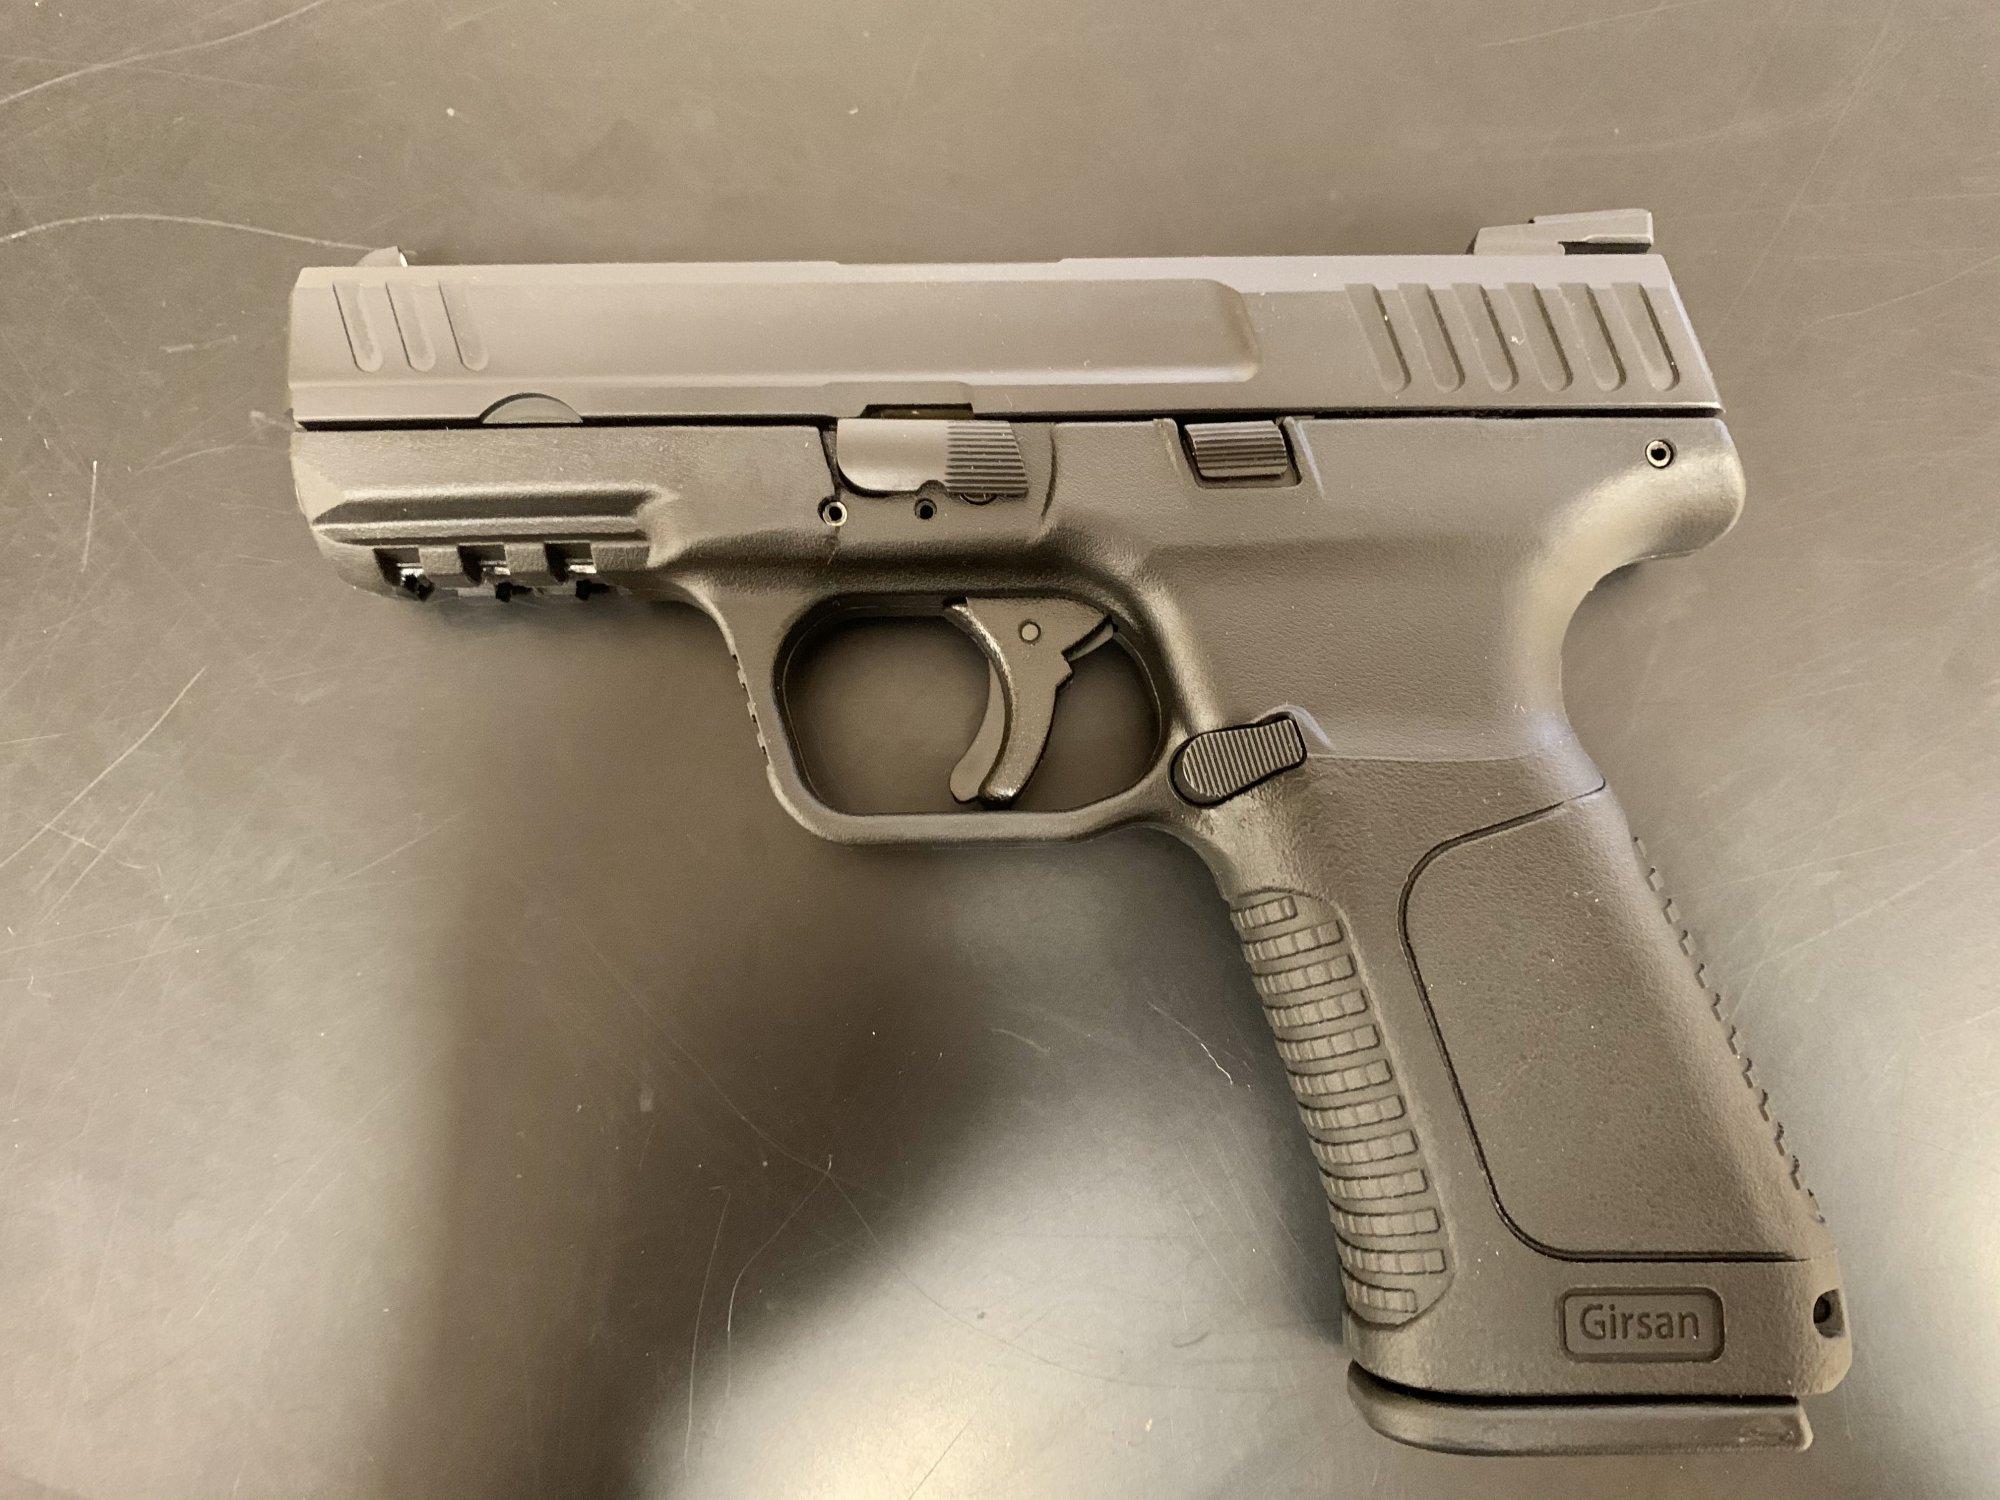 Girsan MC28 9mm Semi-Automatic Pistol